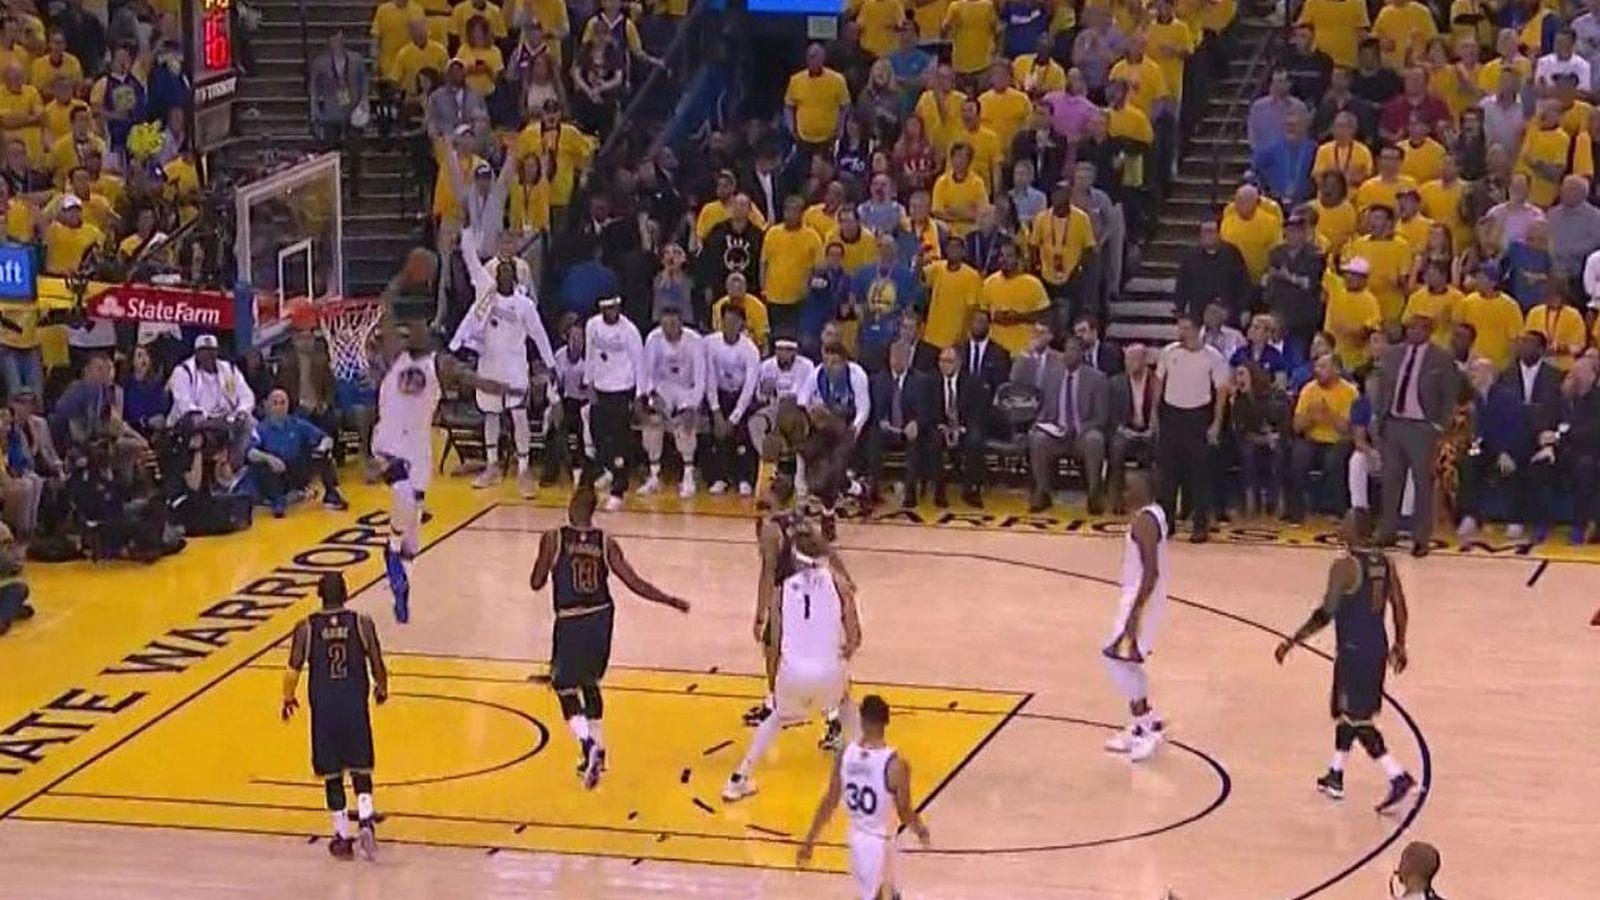 LeBron James' slip on the floor turns into a massive Kevin Durant dunk - SBNation.com